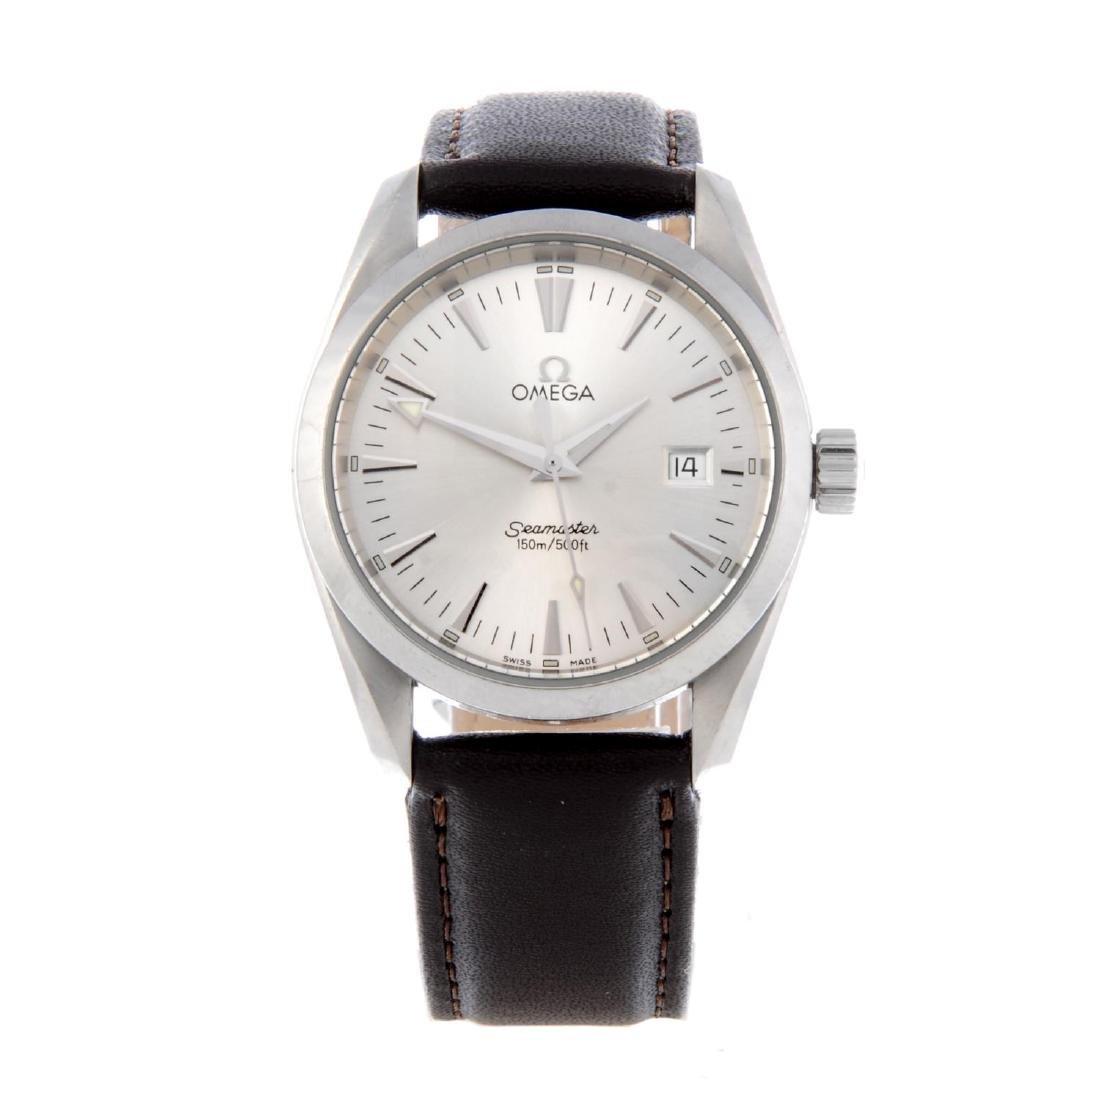 OMEGA - a gentleman's Seamaster Aqua Terra wrist watch.